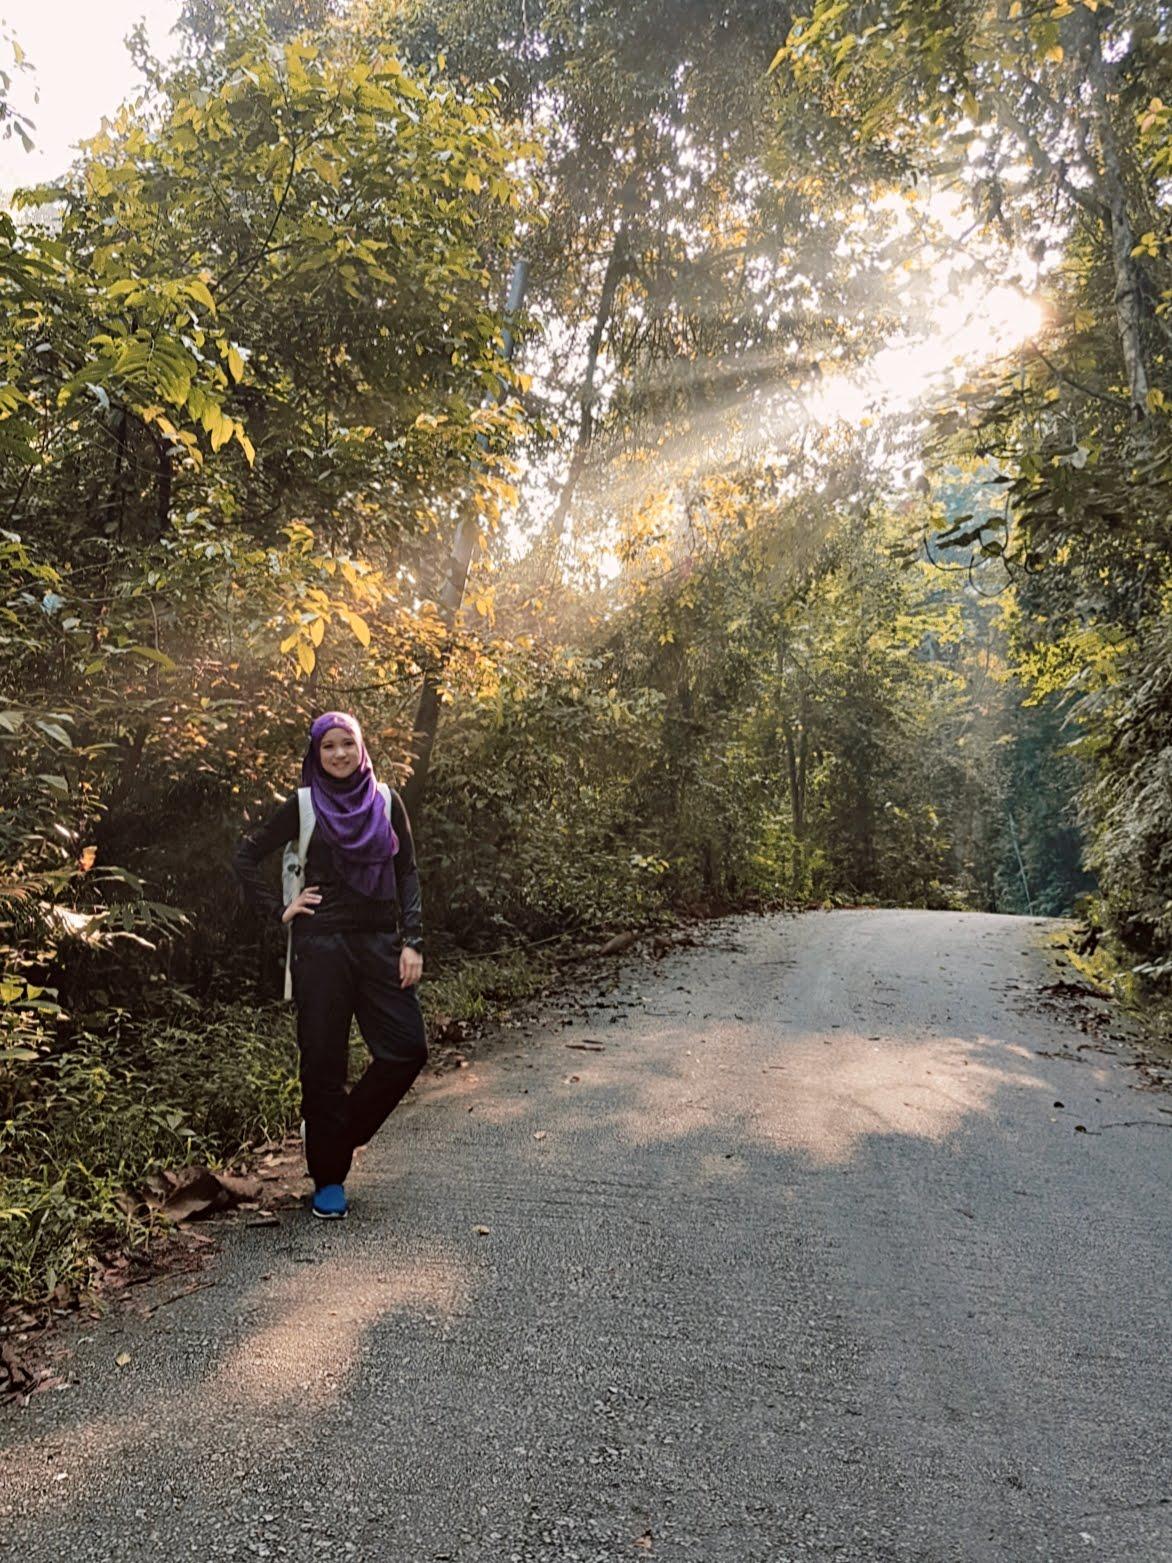 Mt. Pulai, Johor (2018)